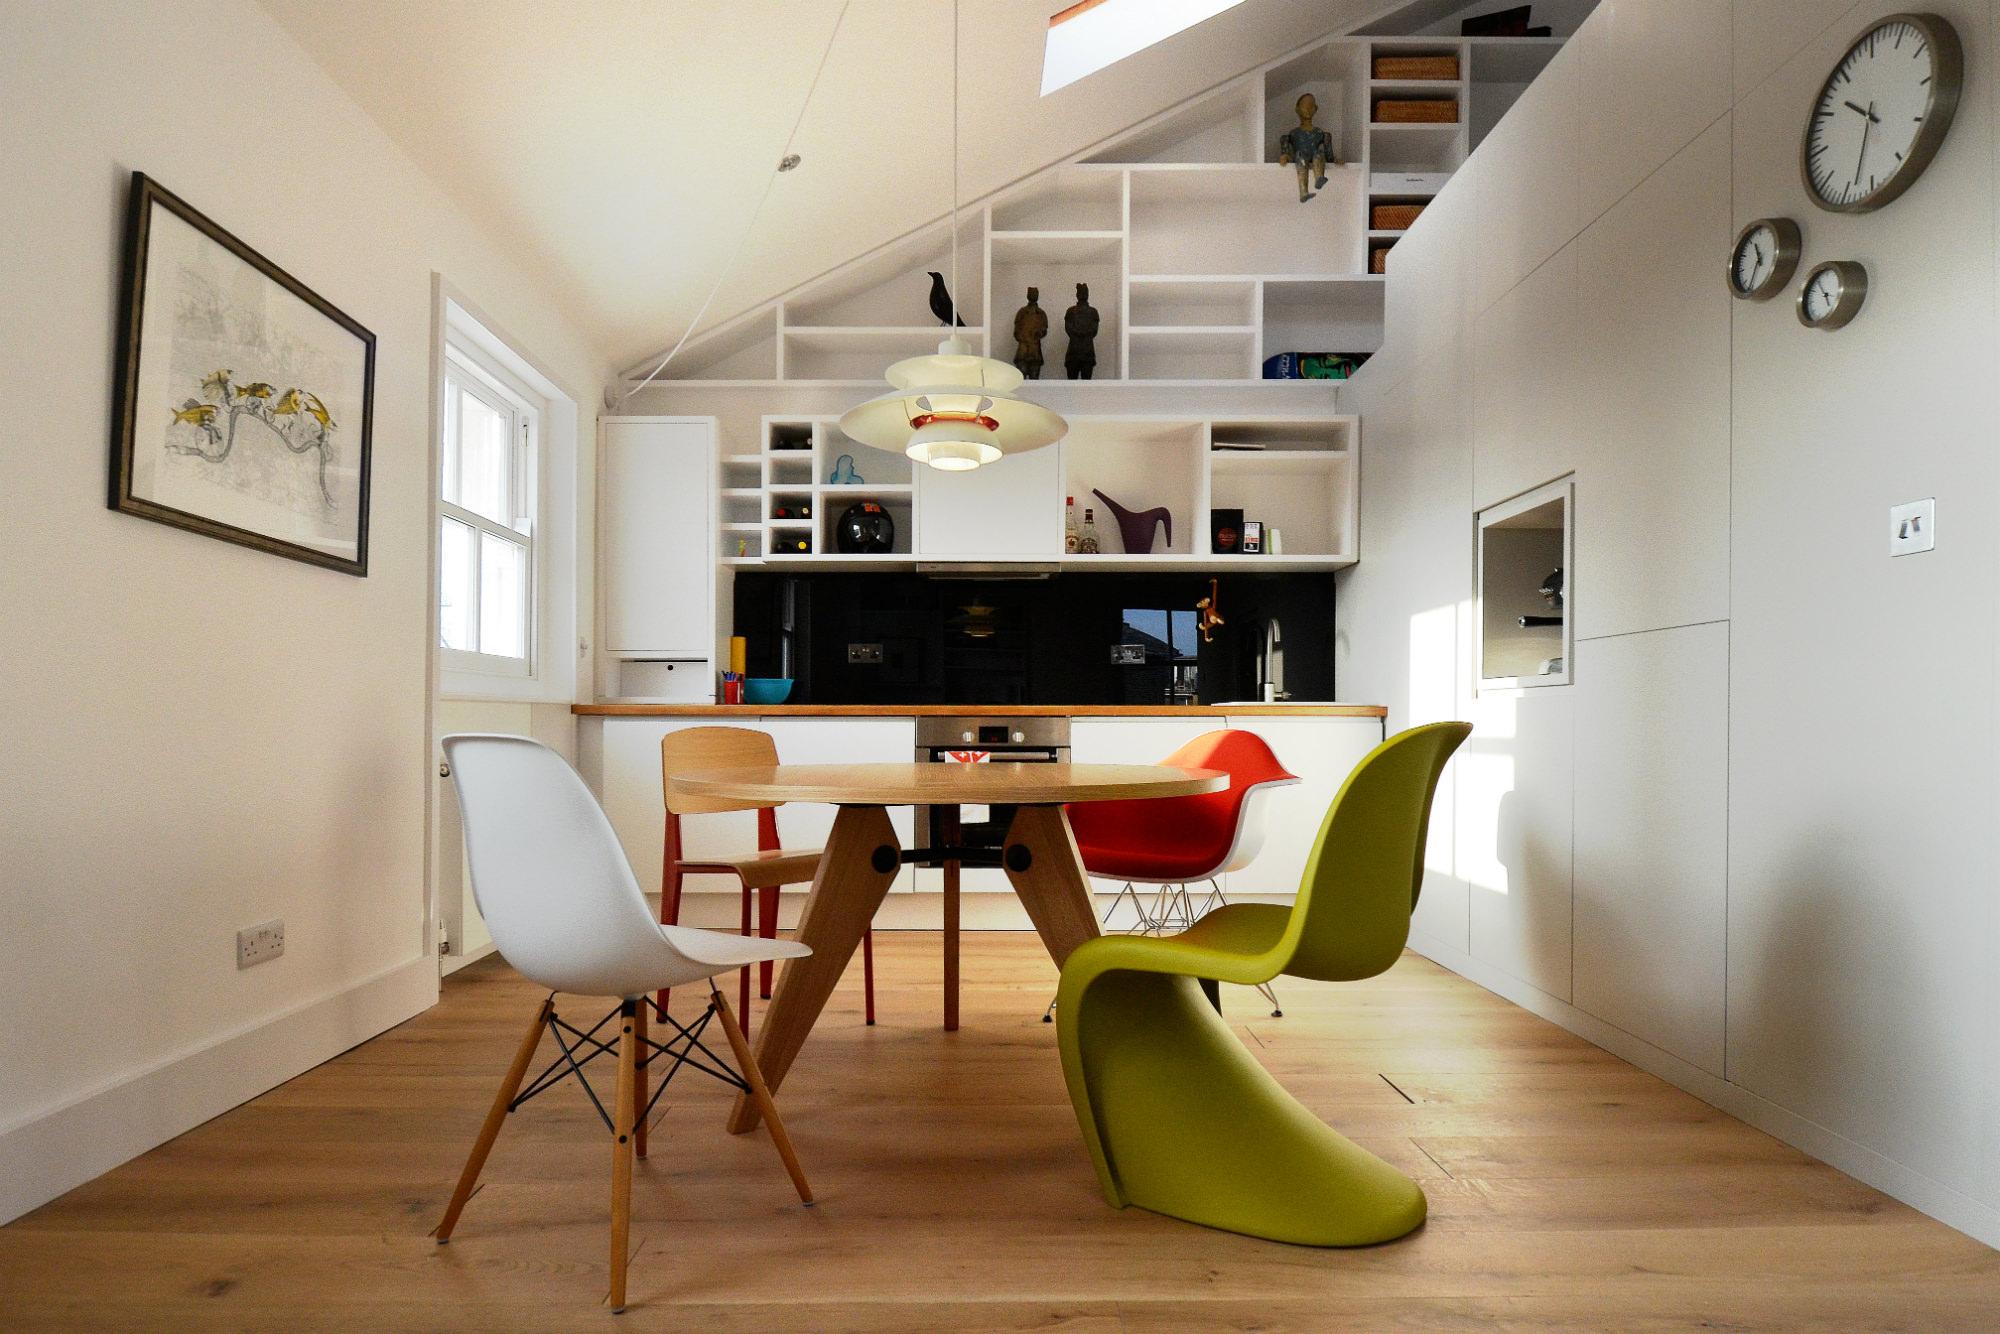 design_loft_camden